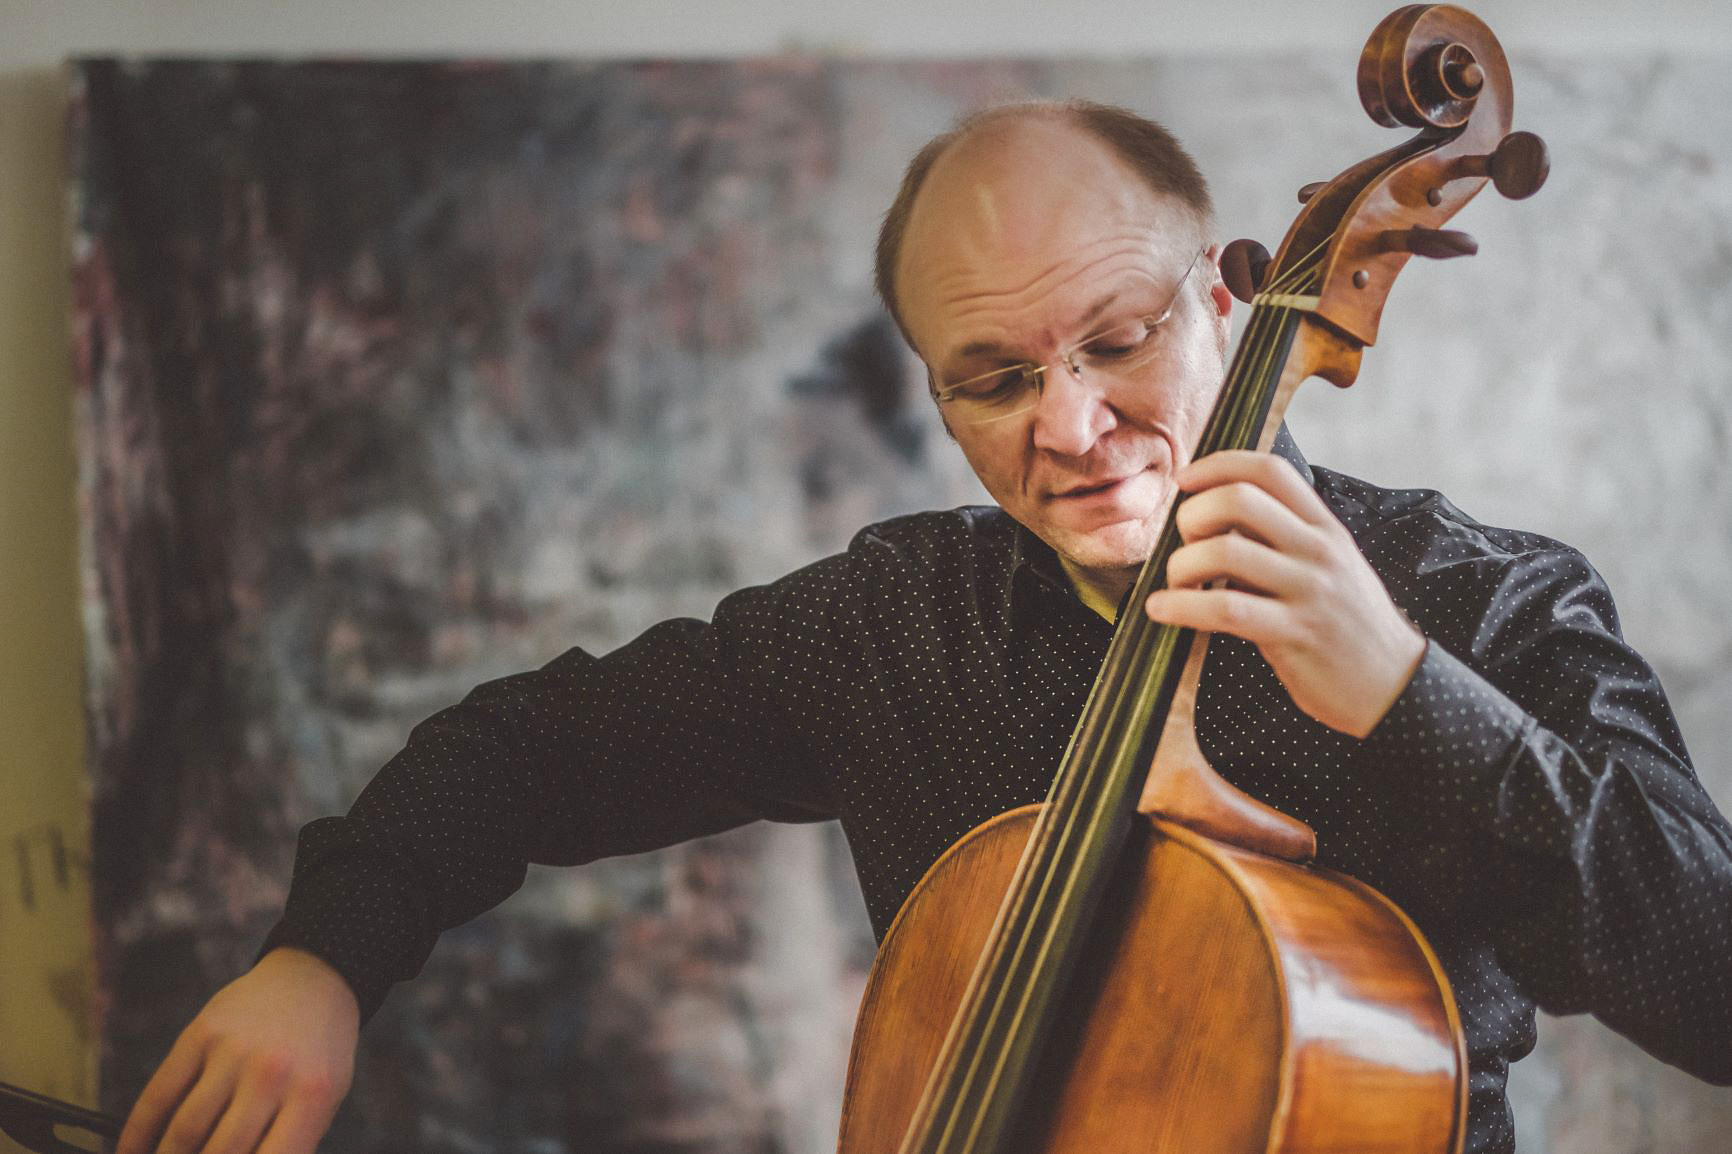 Felix Thiedemann